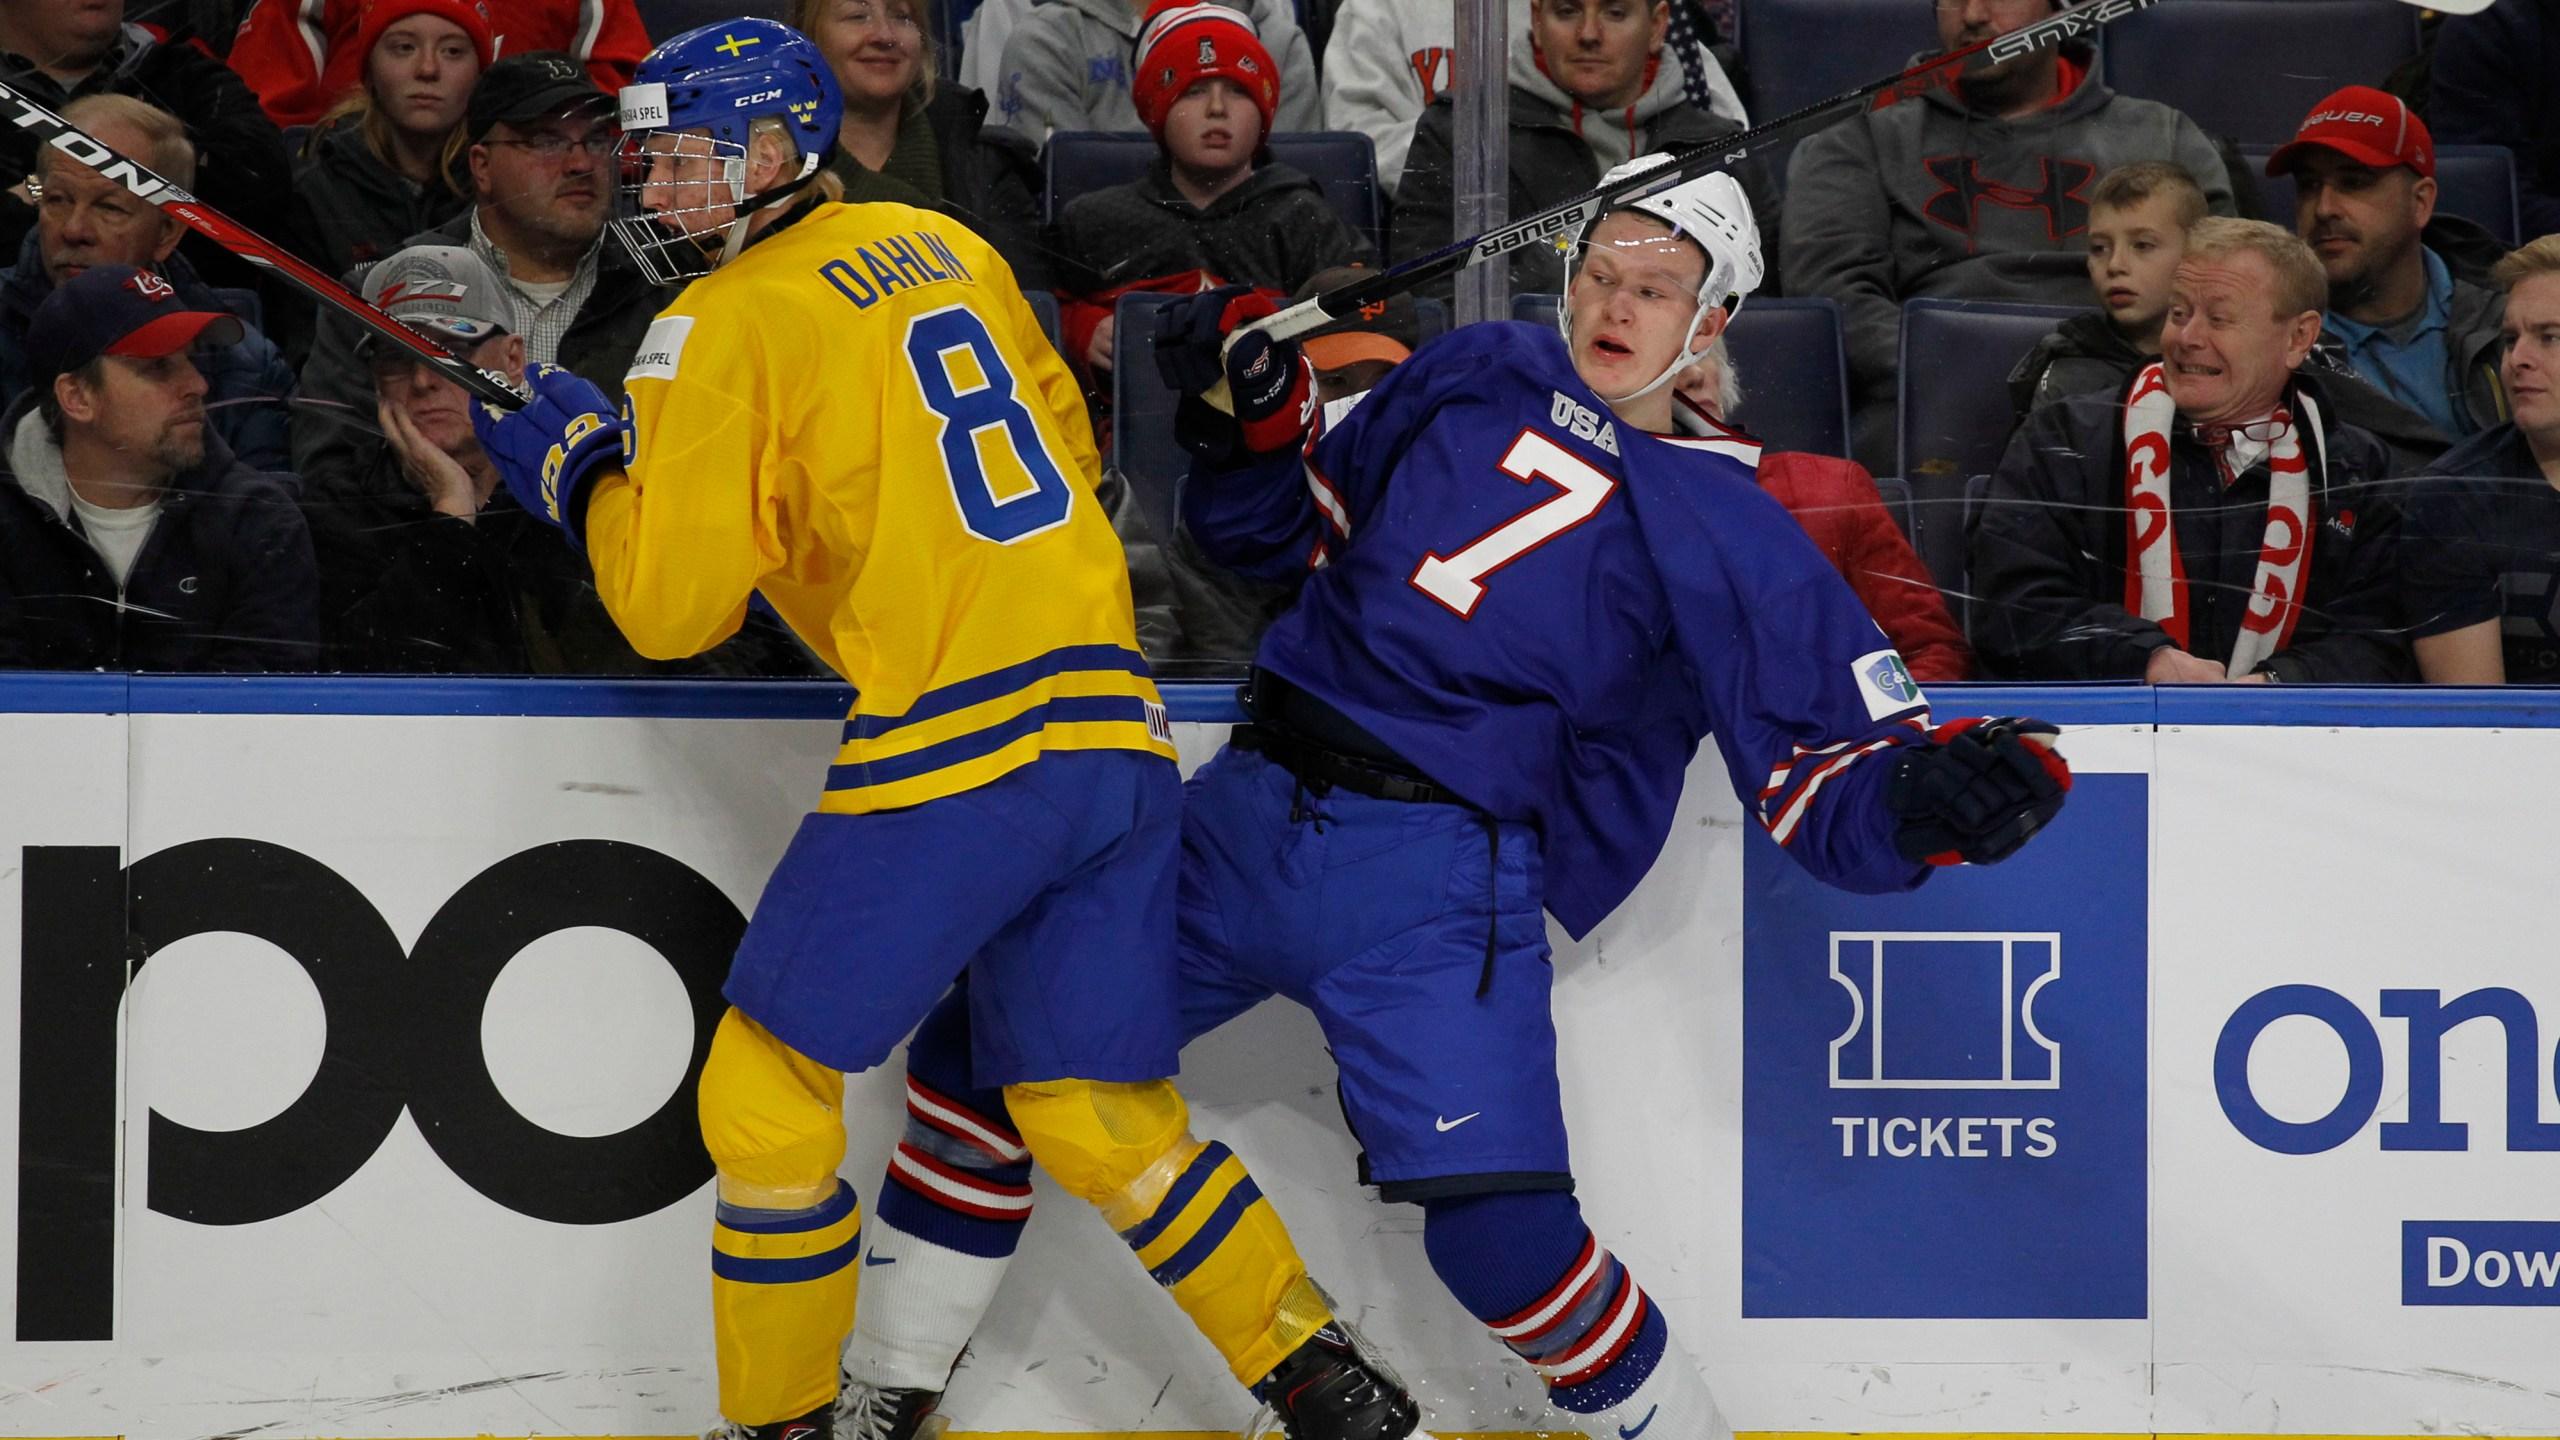 World Juniors Sweden United States Hockey_1525060261220